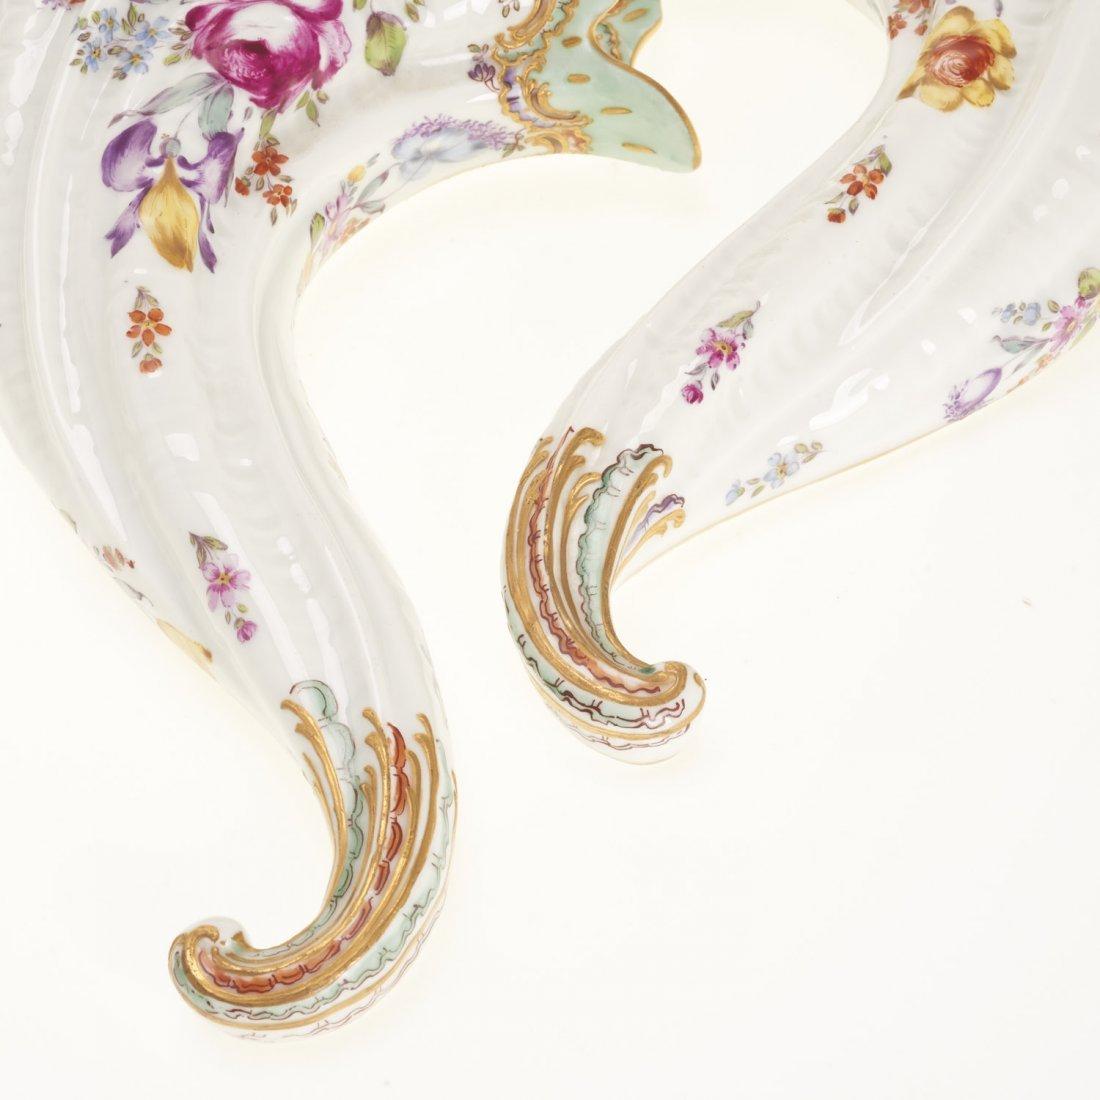 (2) Pr Antique Continental porcelain wall pockets - 2